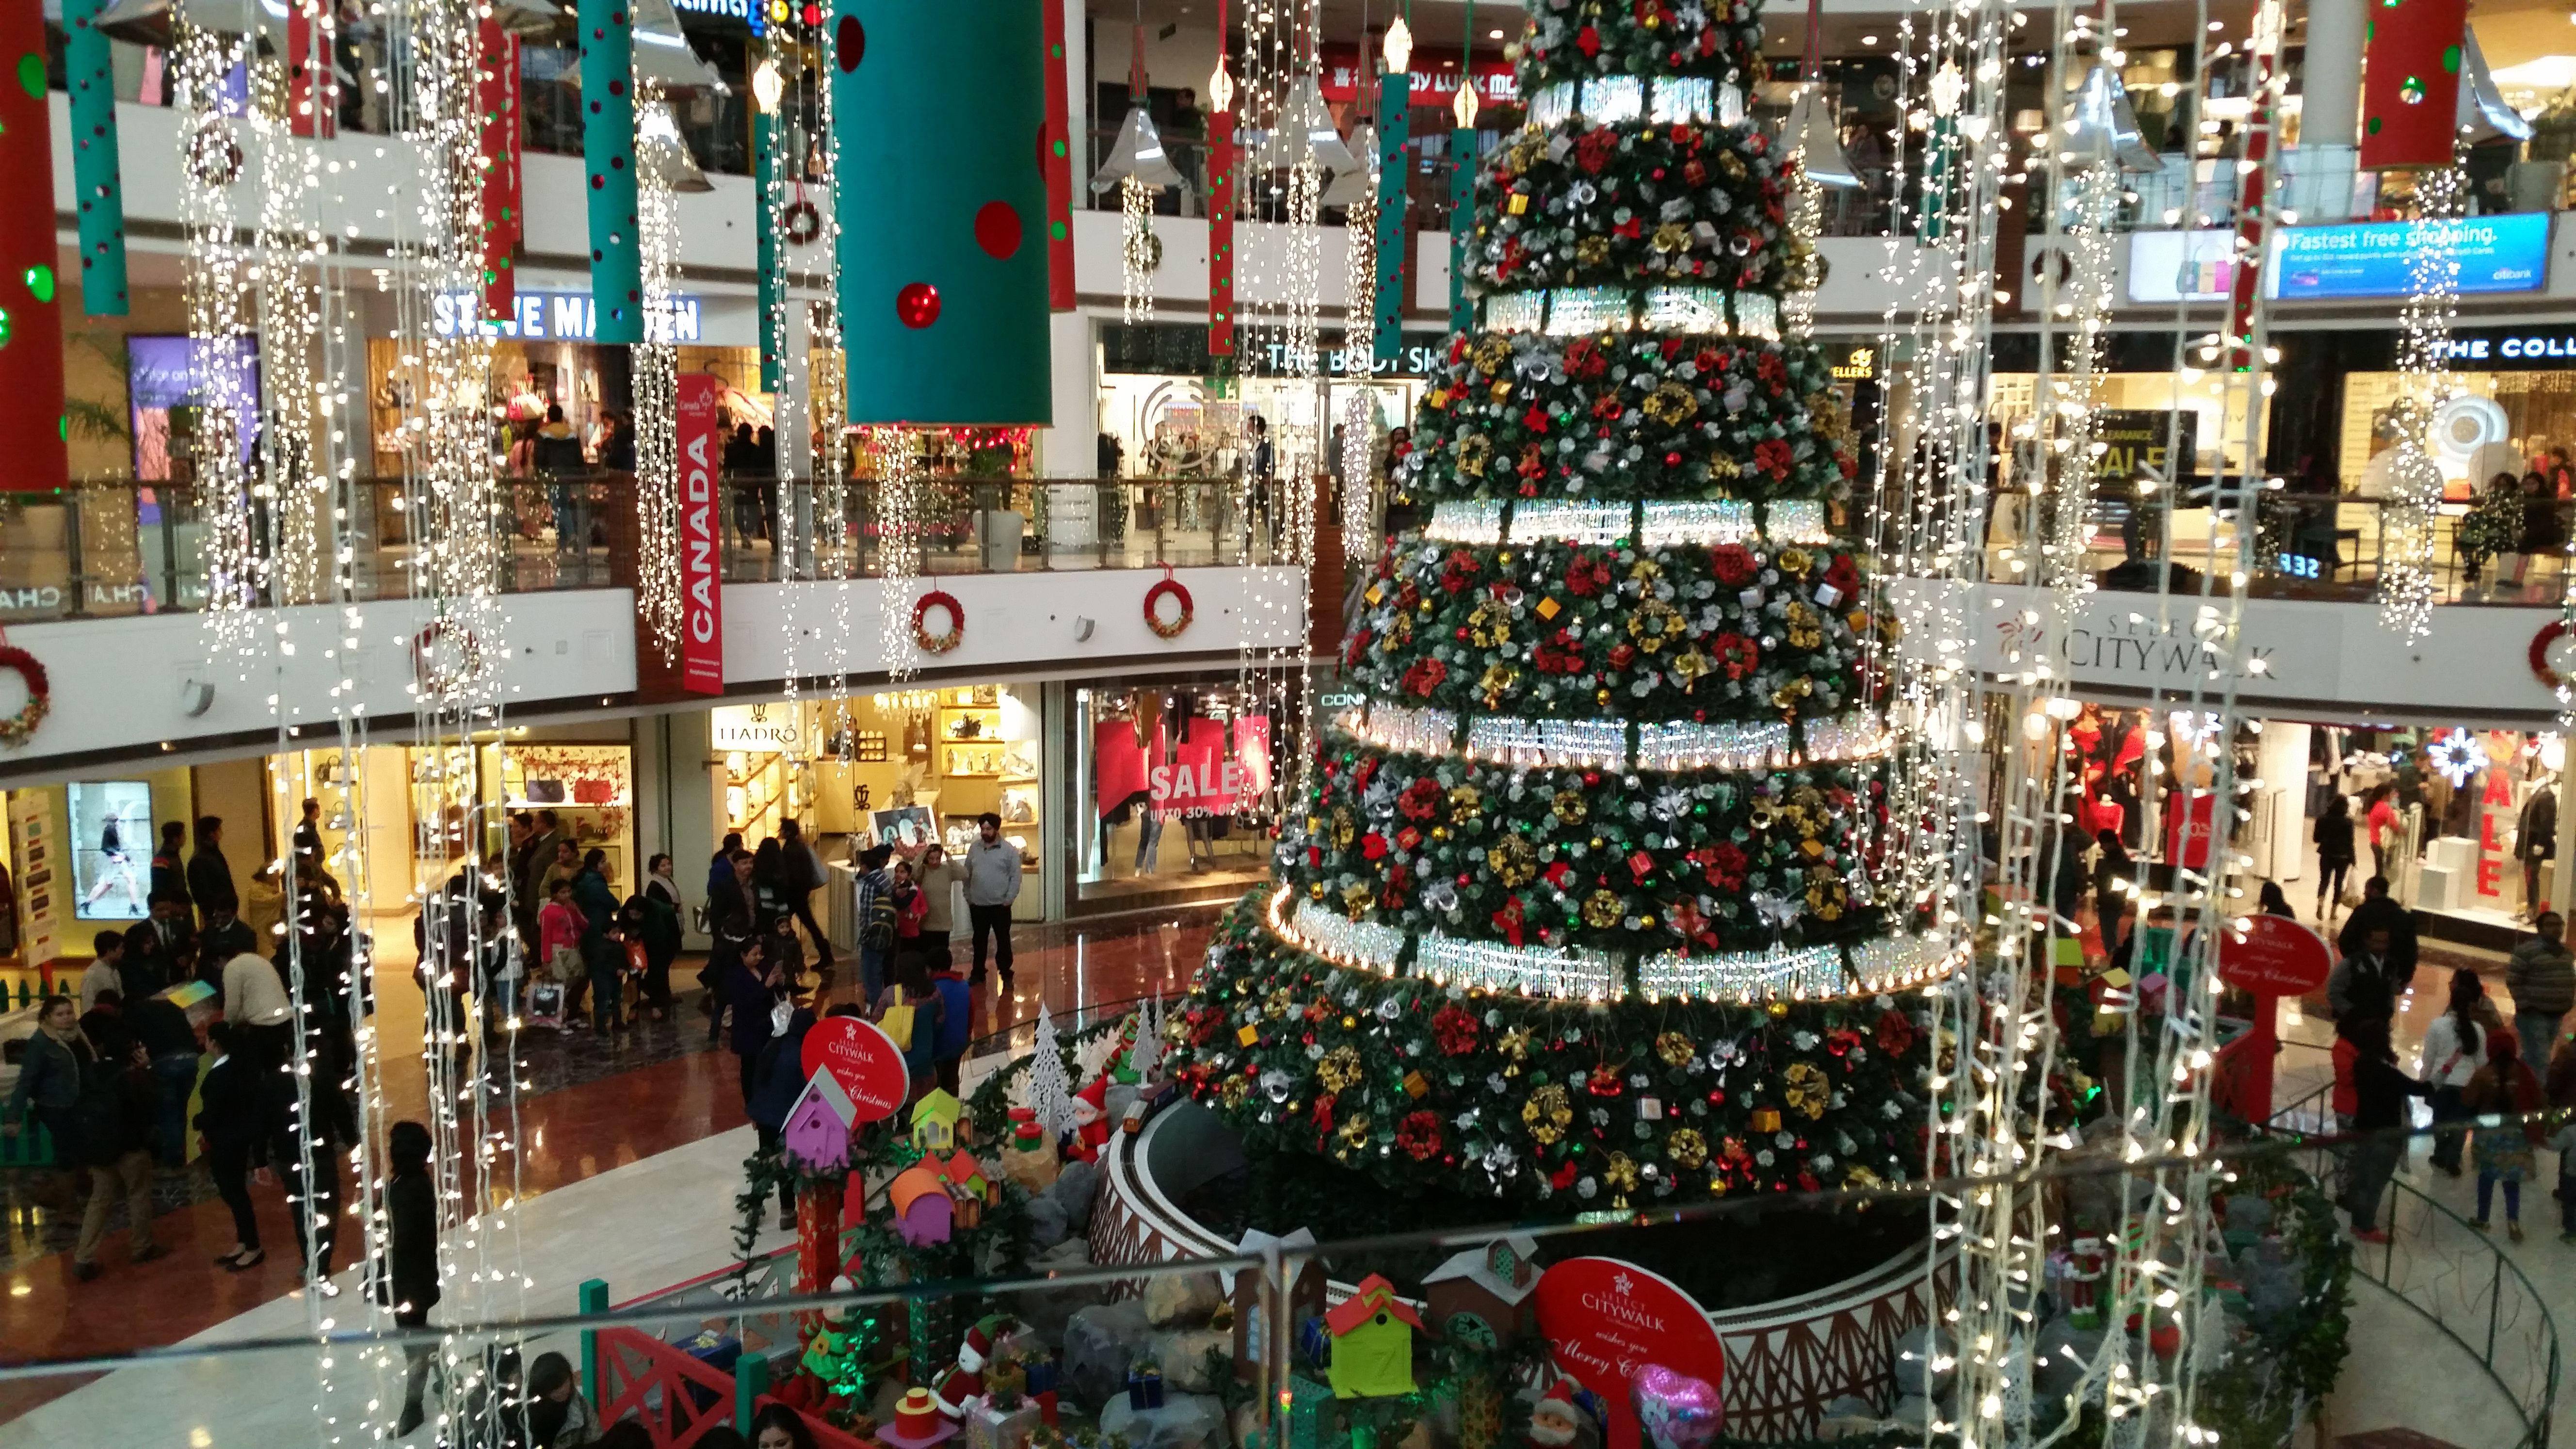 Fish aquarium market in delhi - 3 Floor High Christmas Tree At City Walk Mall Delhi